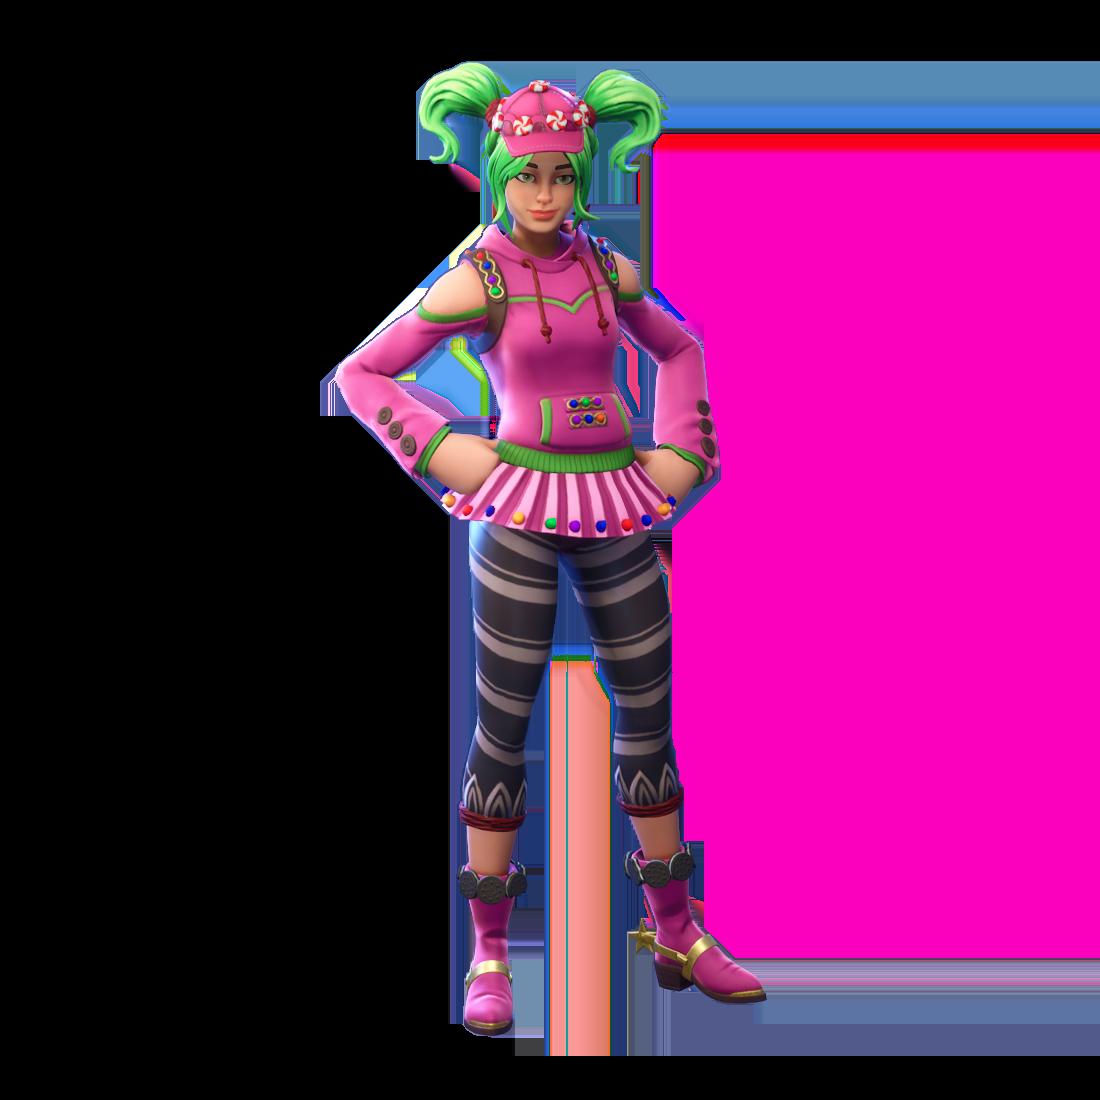 Fortnite Zoey Skin Epic Outfit Fortnite Skins